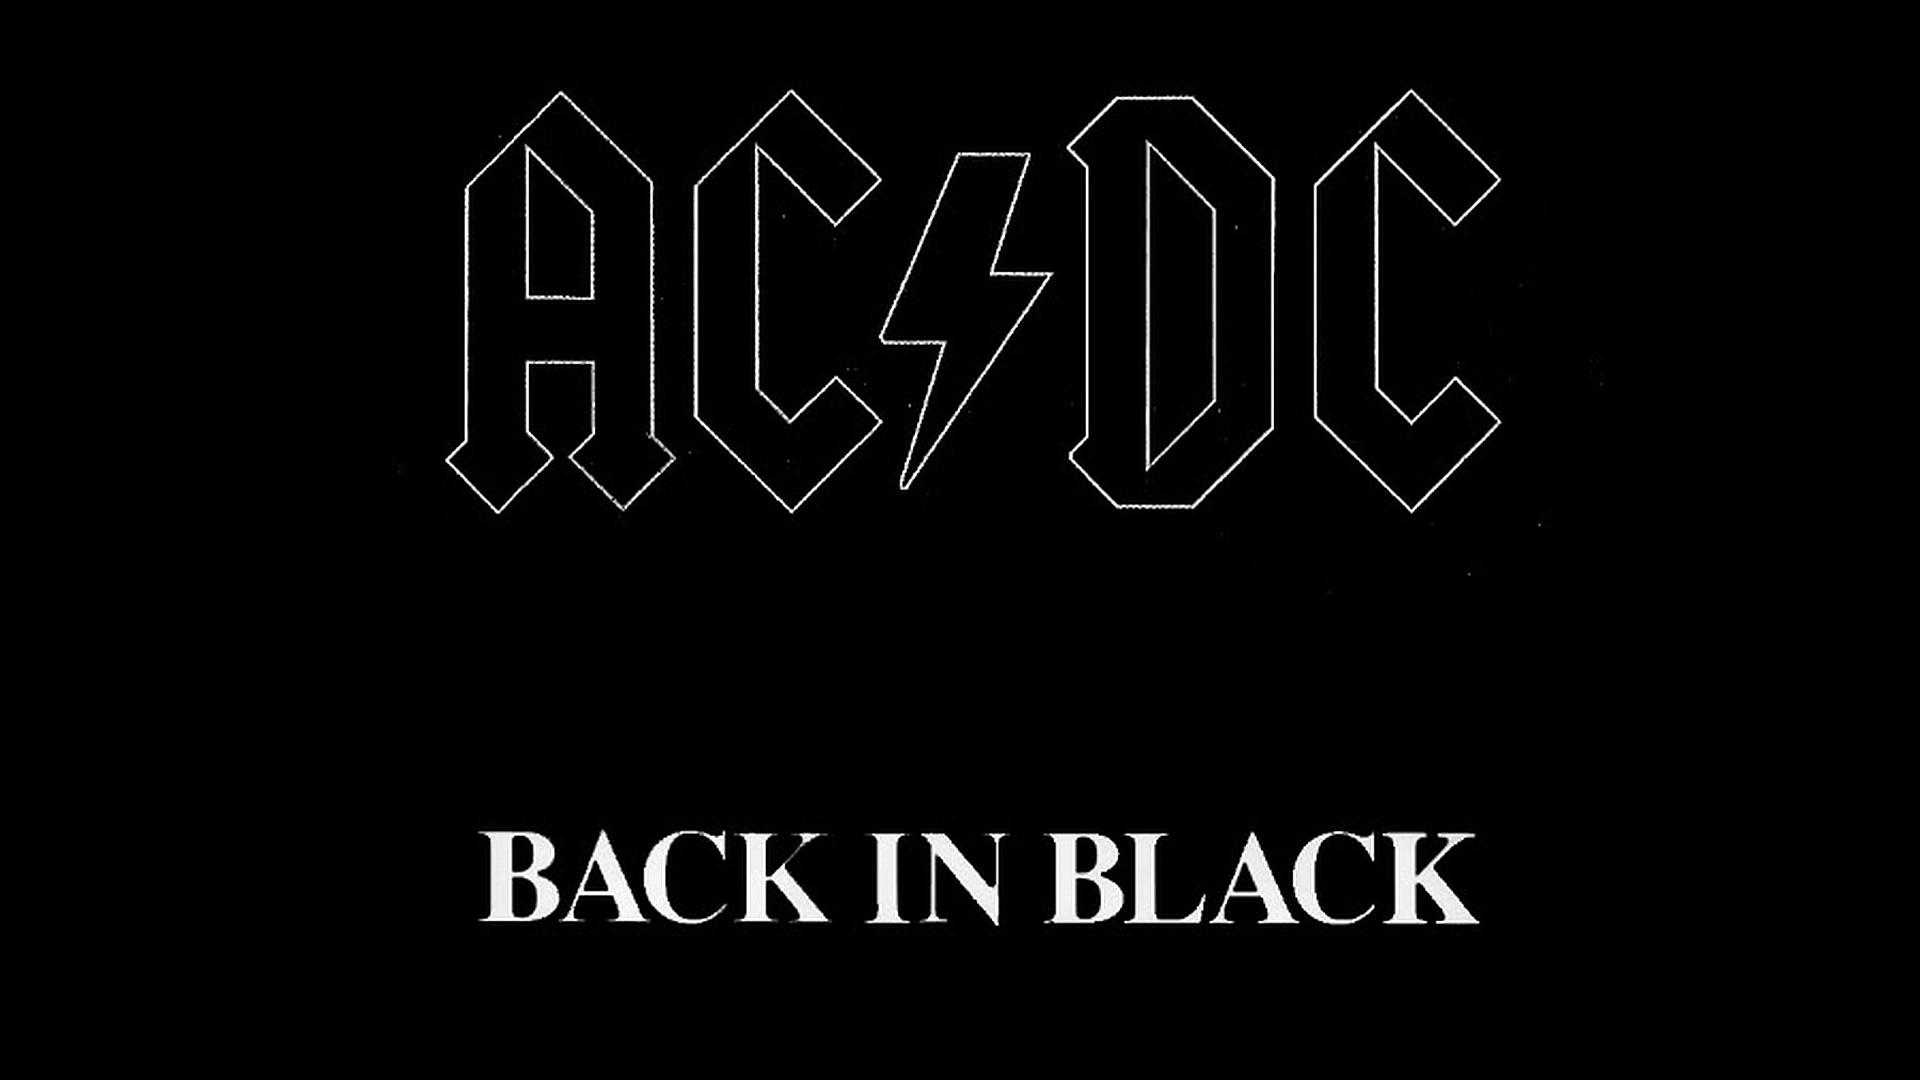 1920x1330 ozzy osbourne heavy metal black sabbath rock wallpaper 1920x1330 478913 wallpaperup